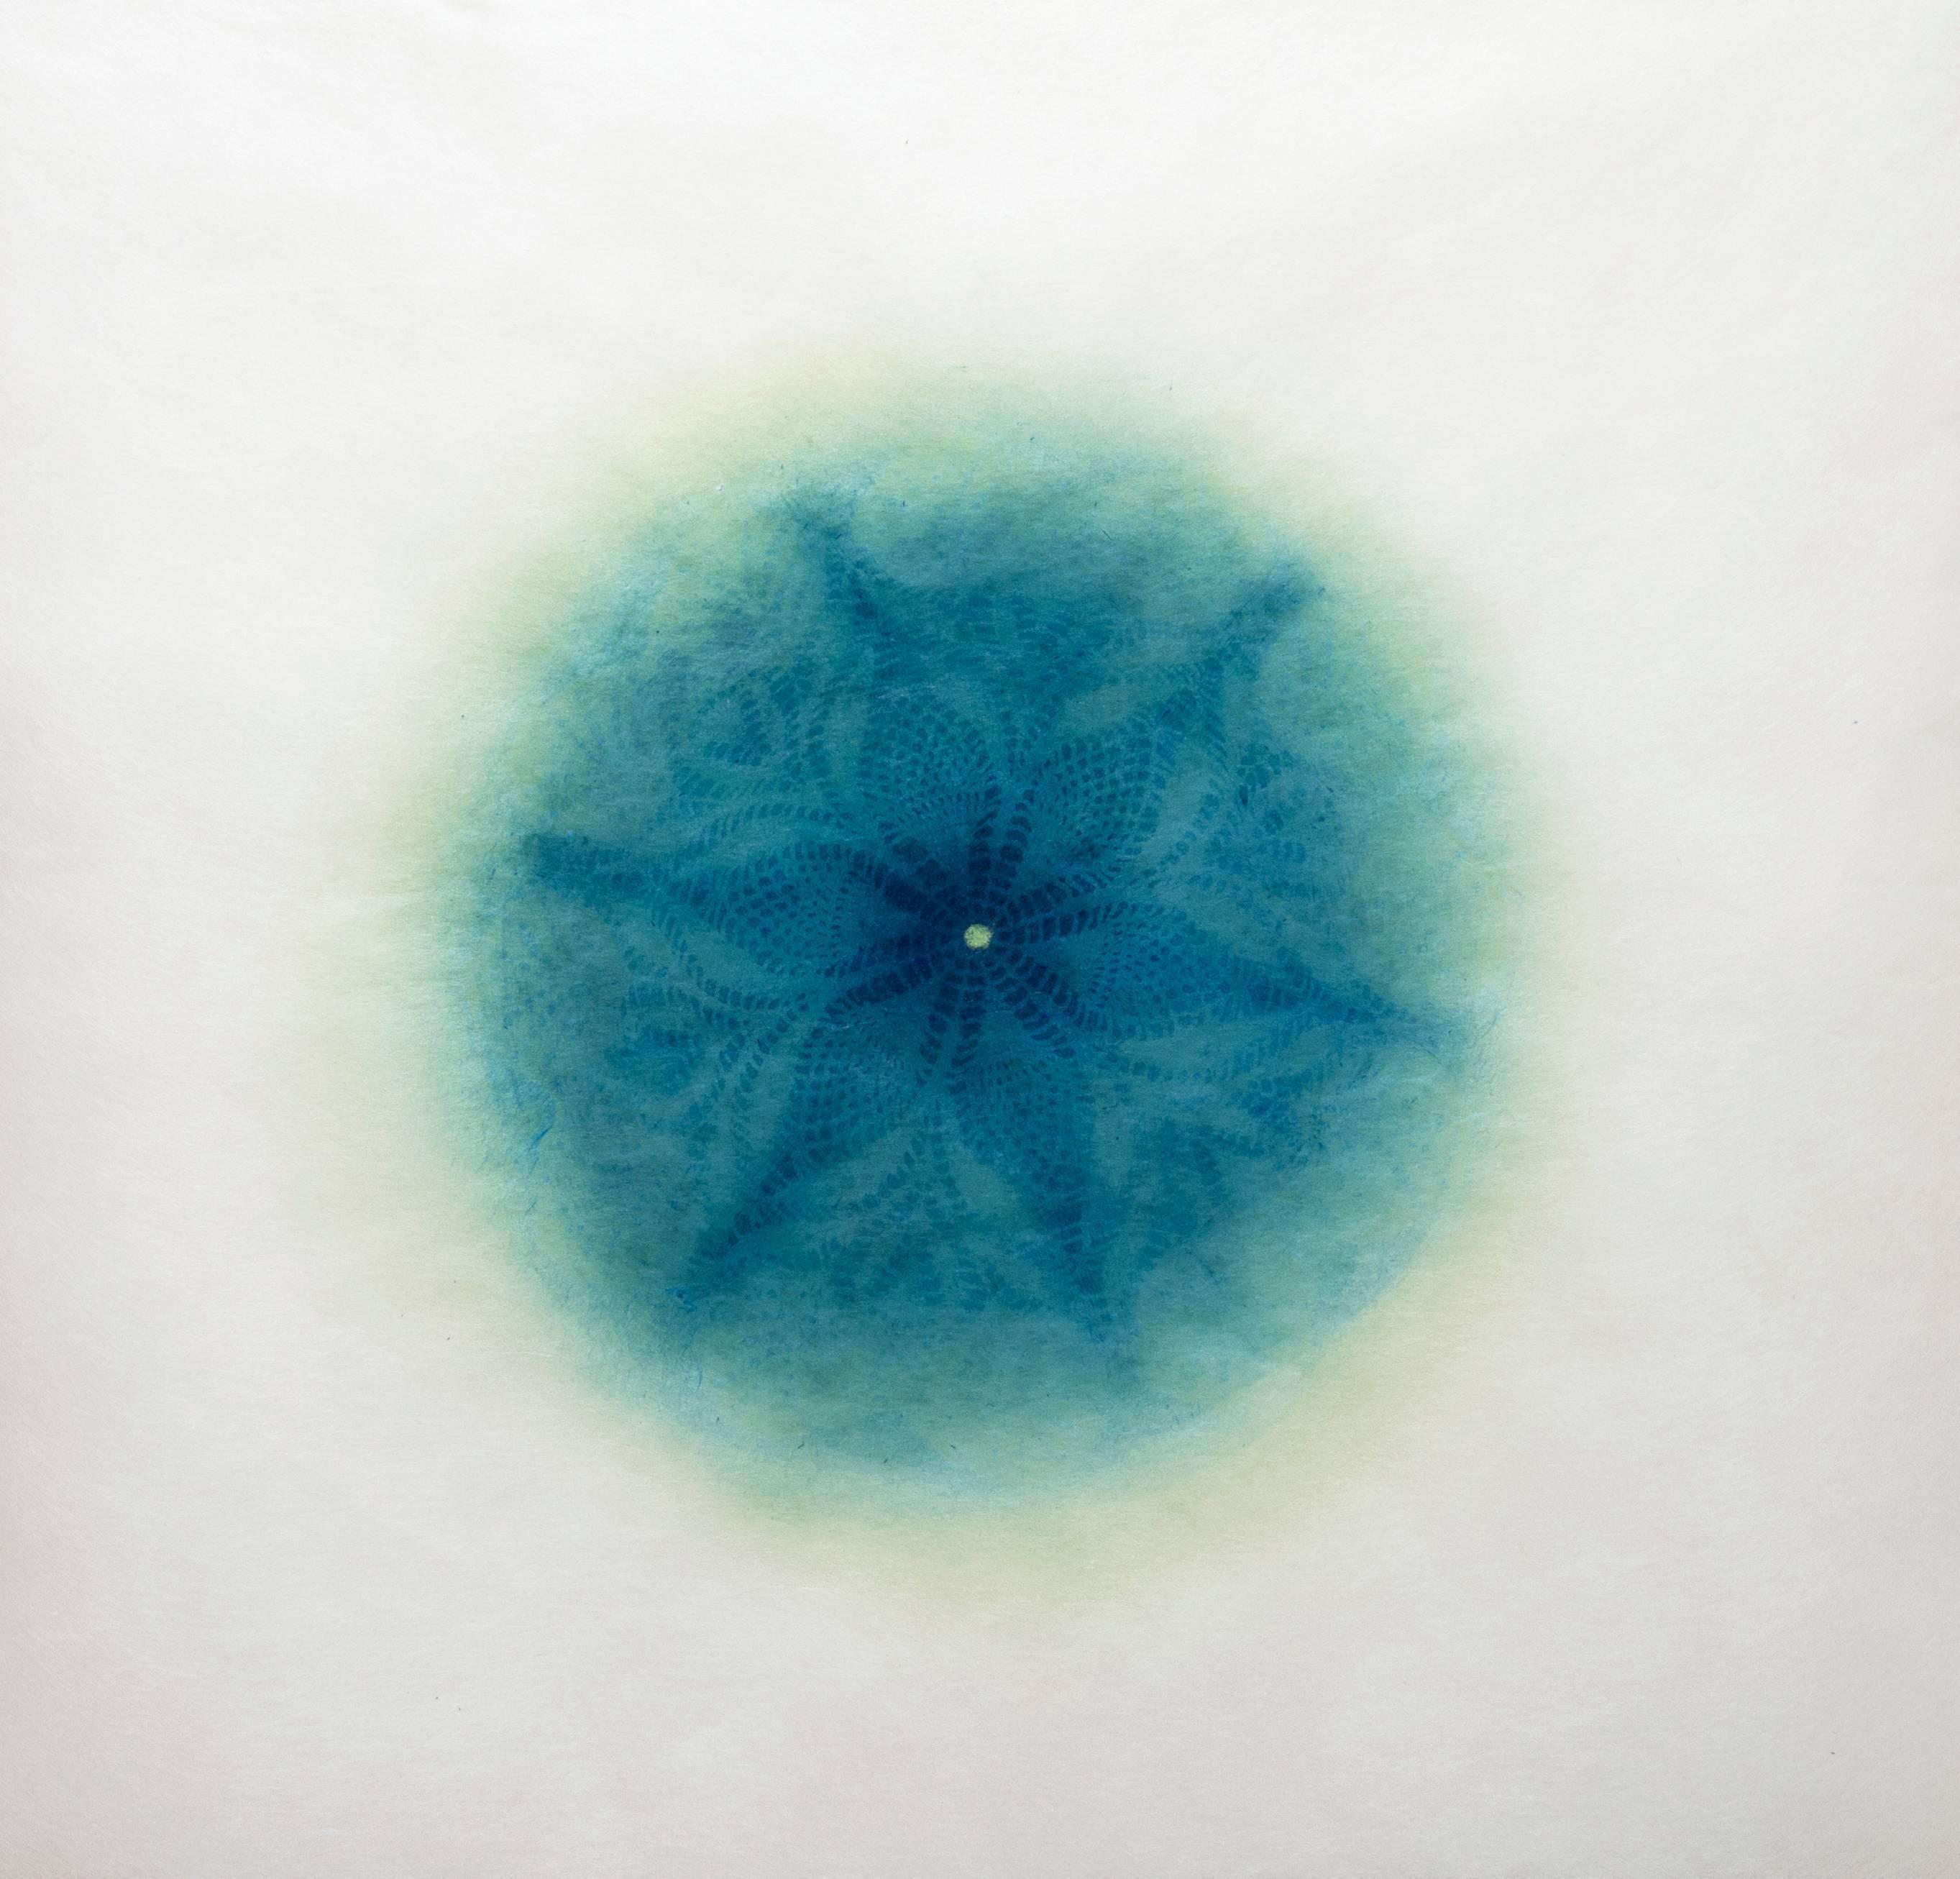 Revolution IX - Blue geometric abstract monoprint and laser cut rice paper